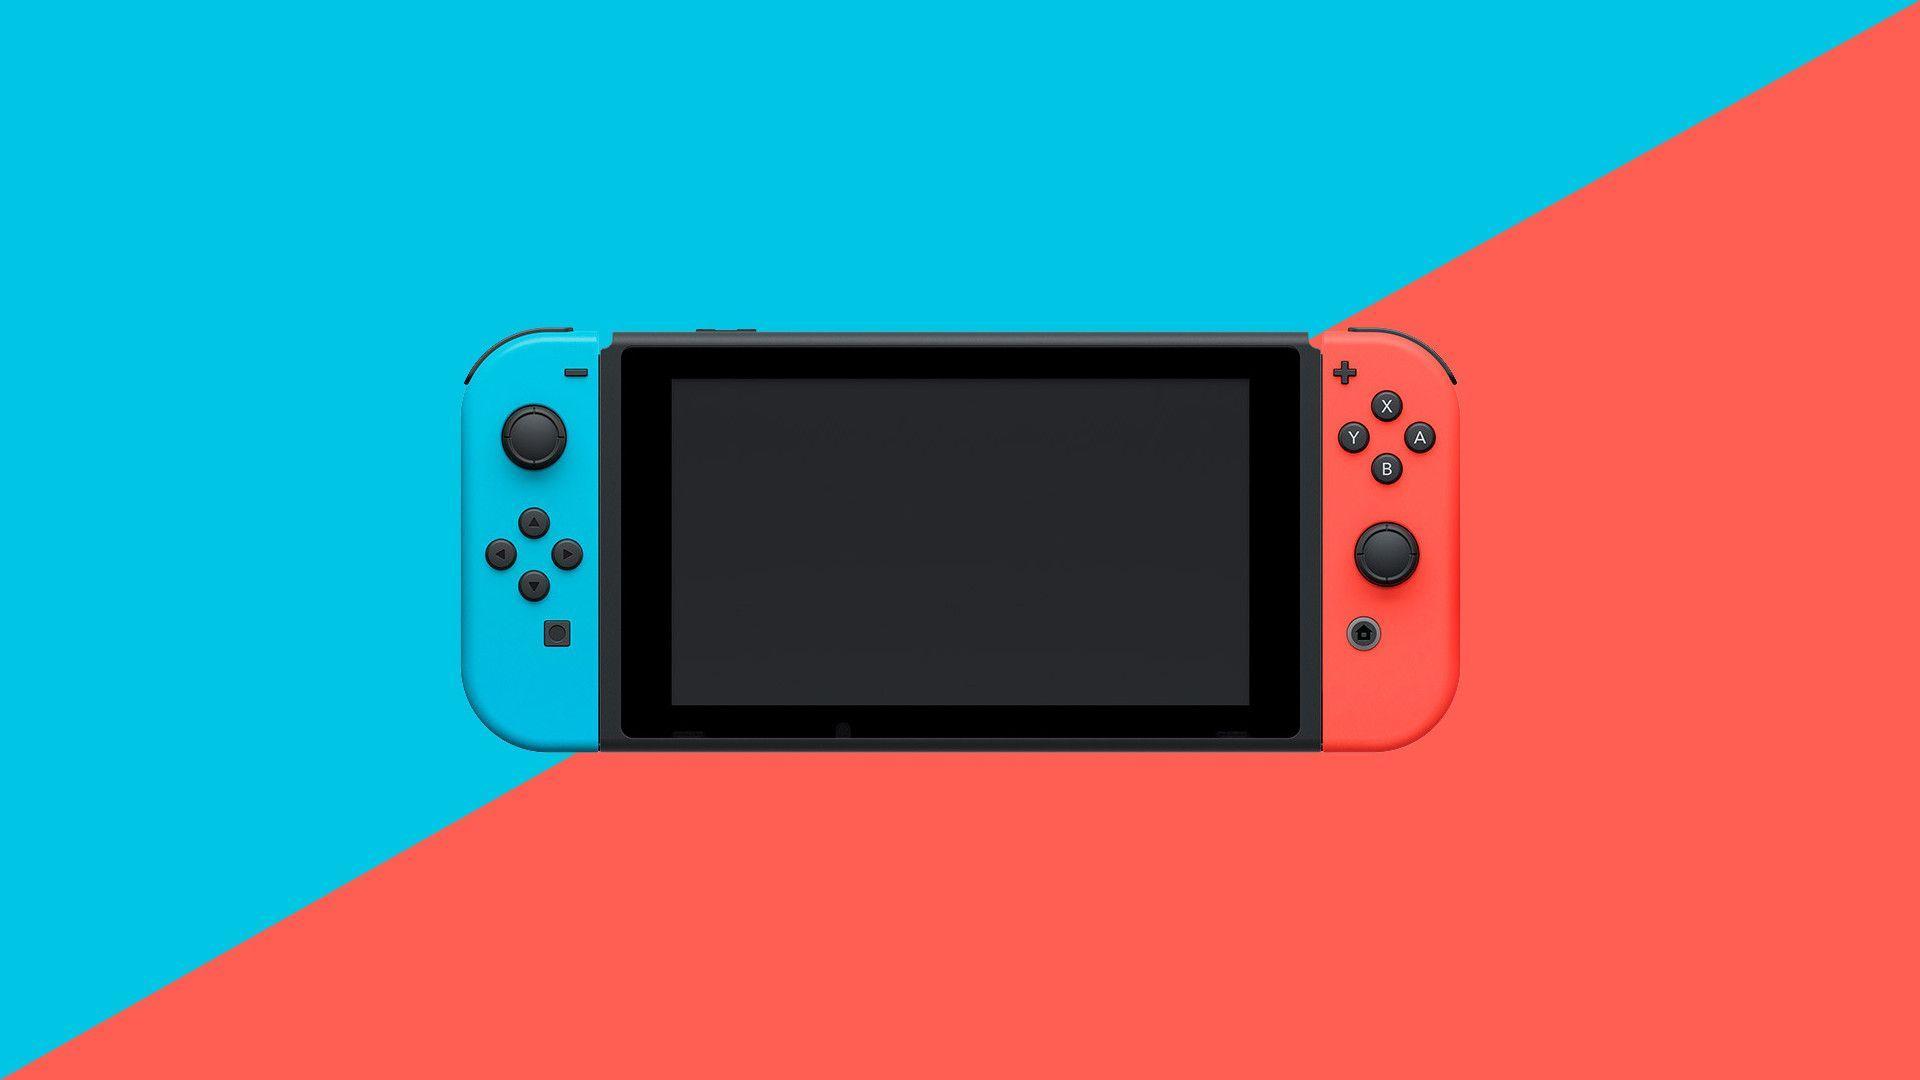 Nintendo Switch 4K Phone Wallpapers - Top Free Nintendo Switch 4K Phone  Backgrounds - WallpaperAccess